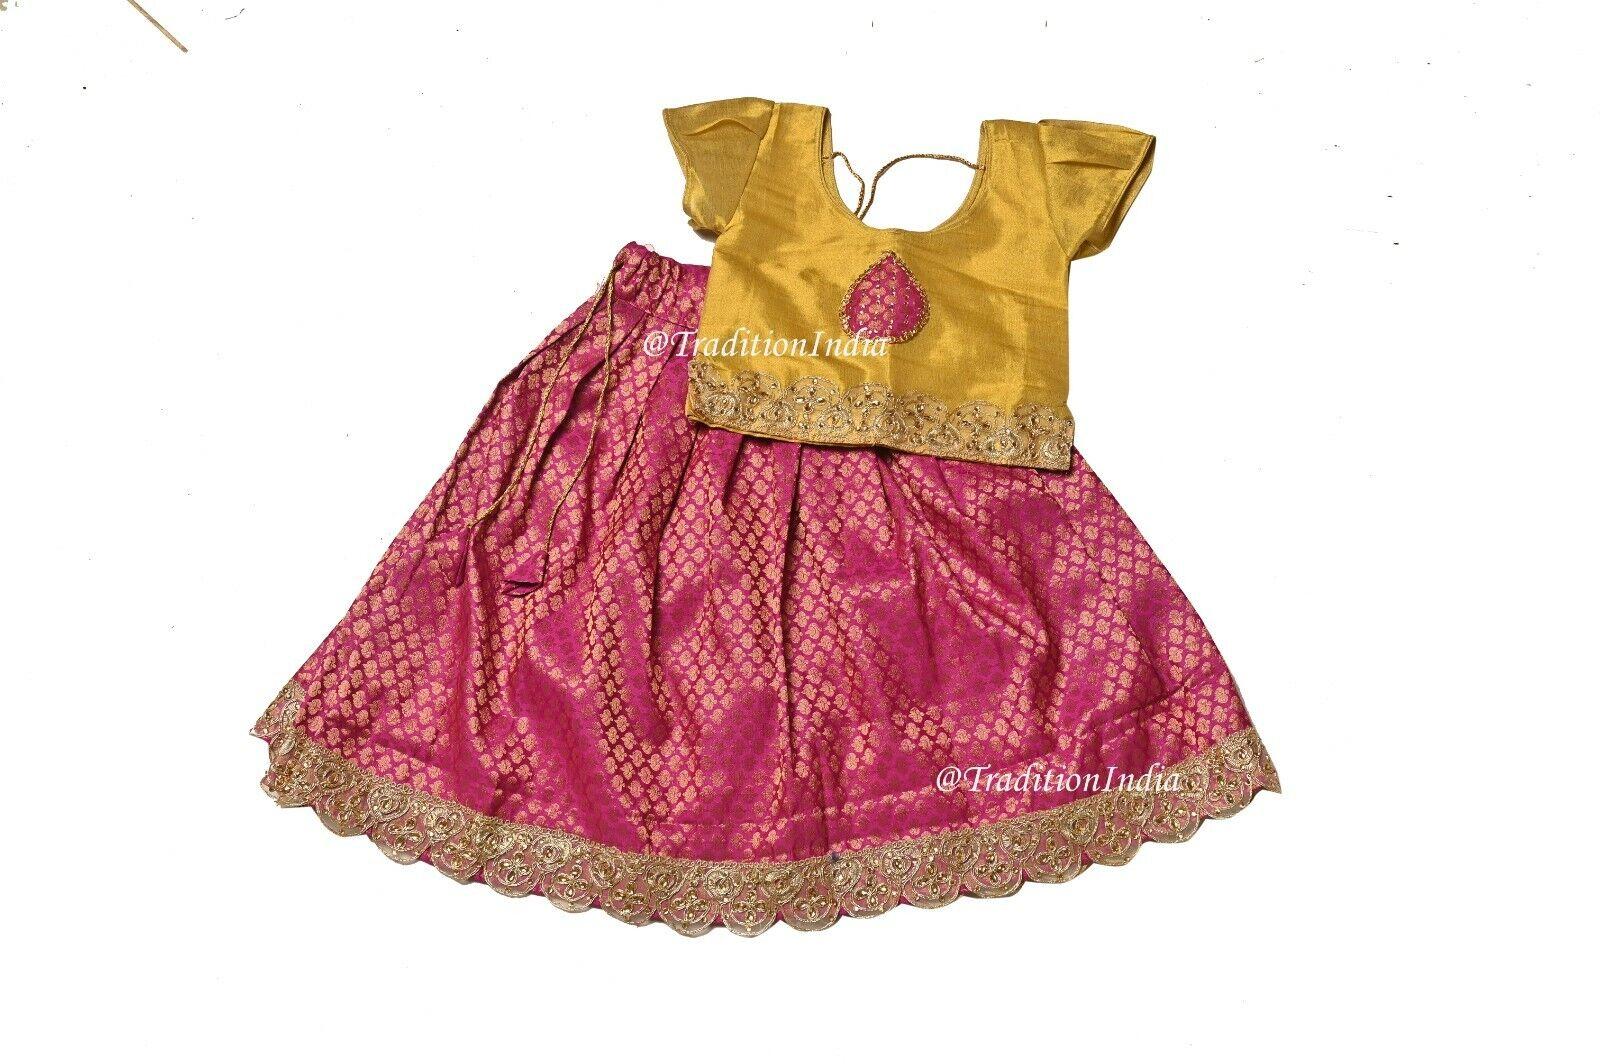 Little Girls Pavadai Set, Readymade Kids Lehenga, Festive Ethnic Wear,